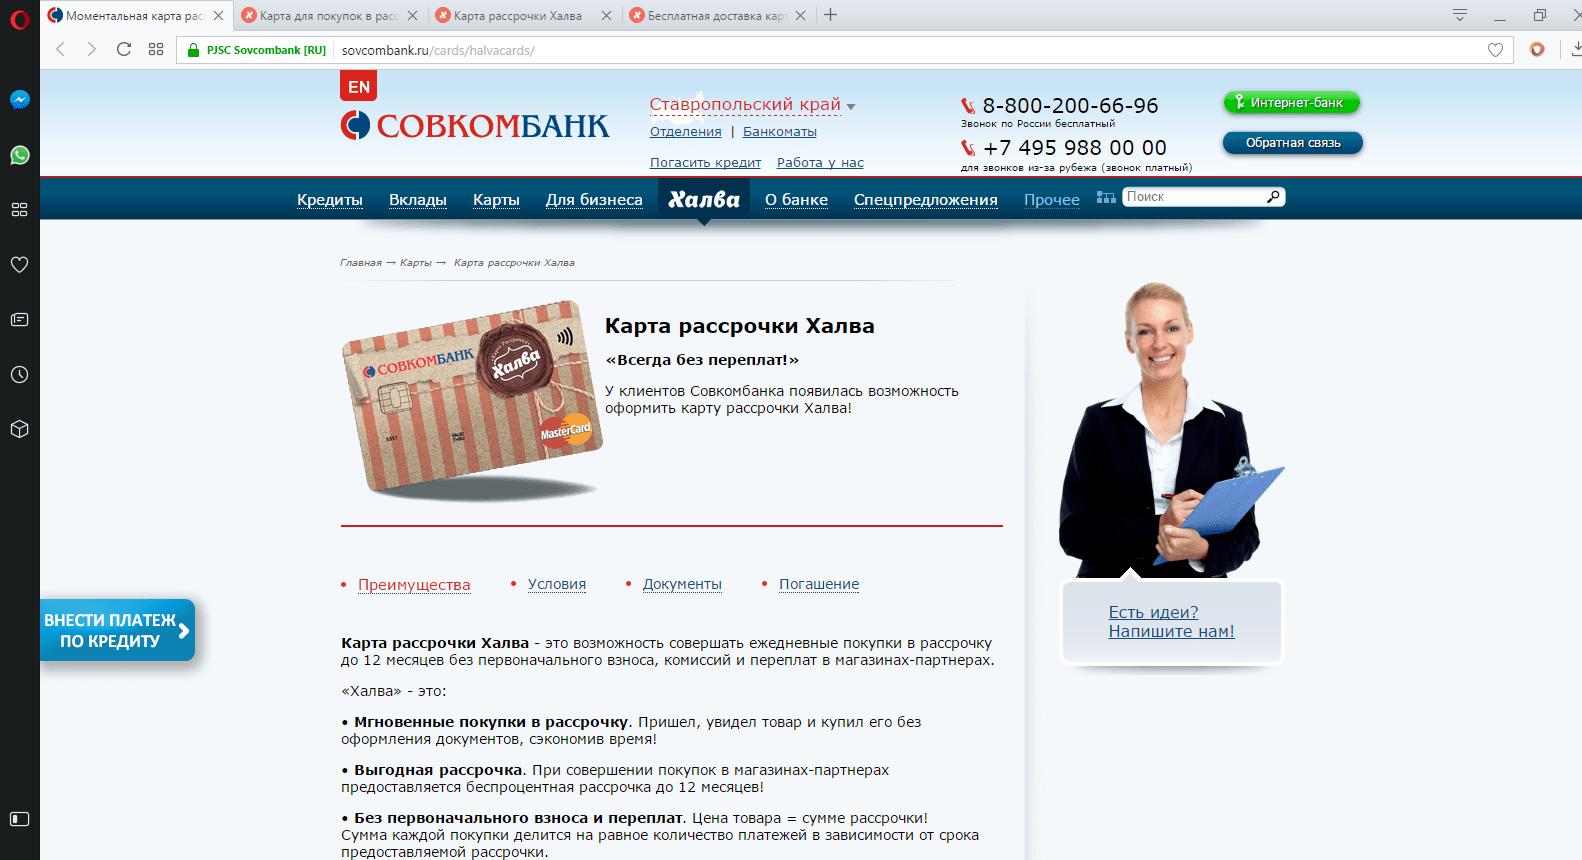 Как получить карту Халва Совкомбанка онлайн на сайте банка